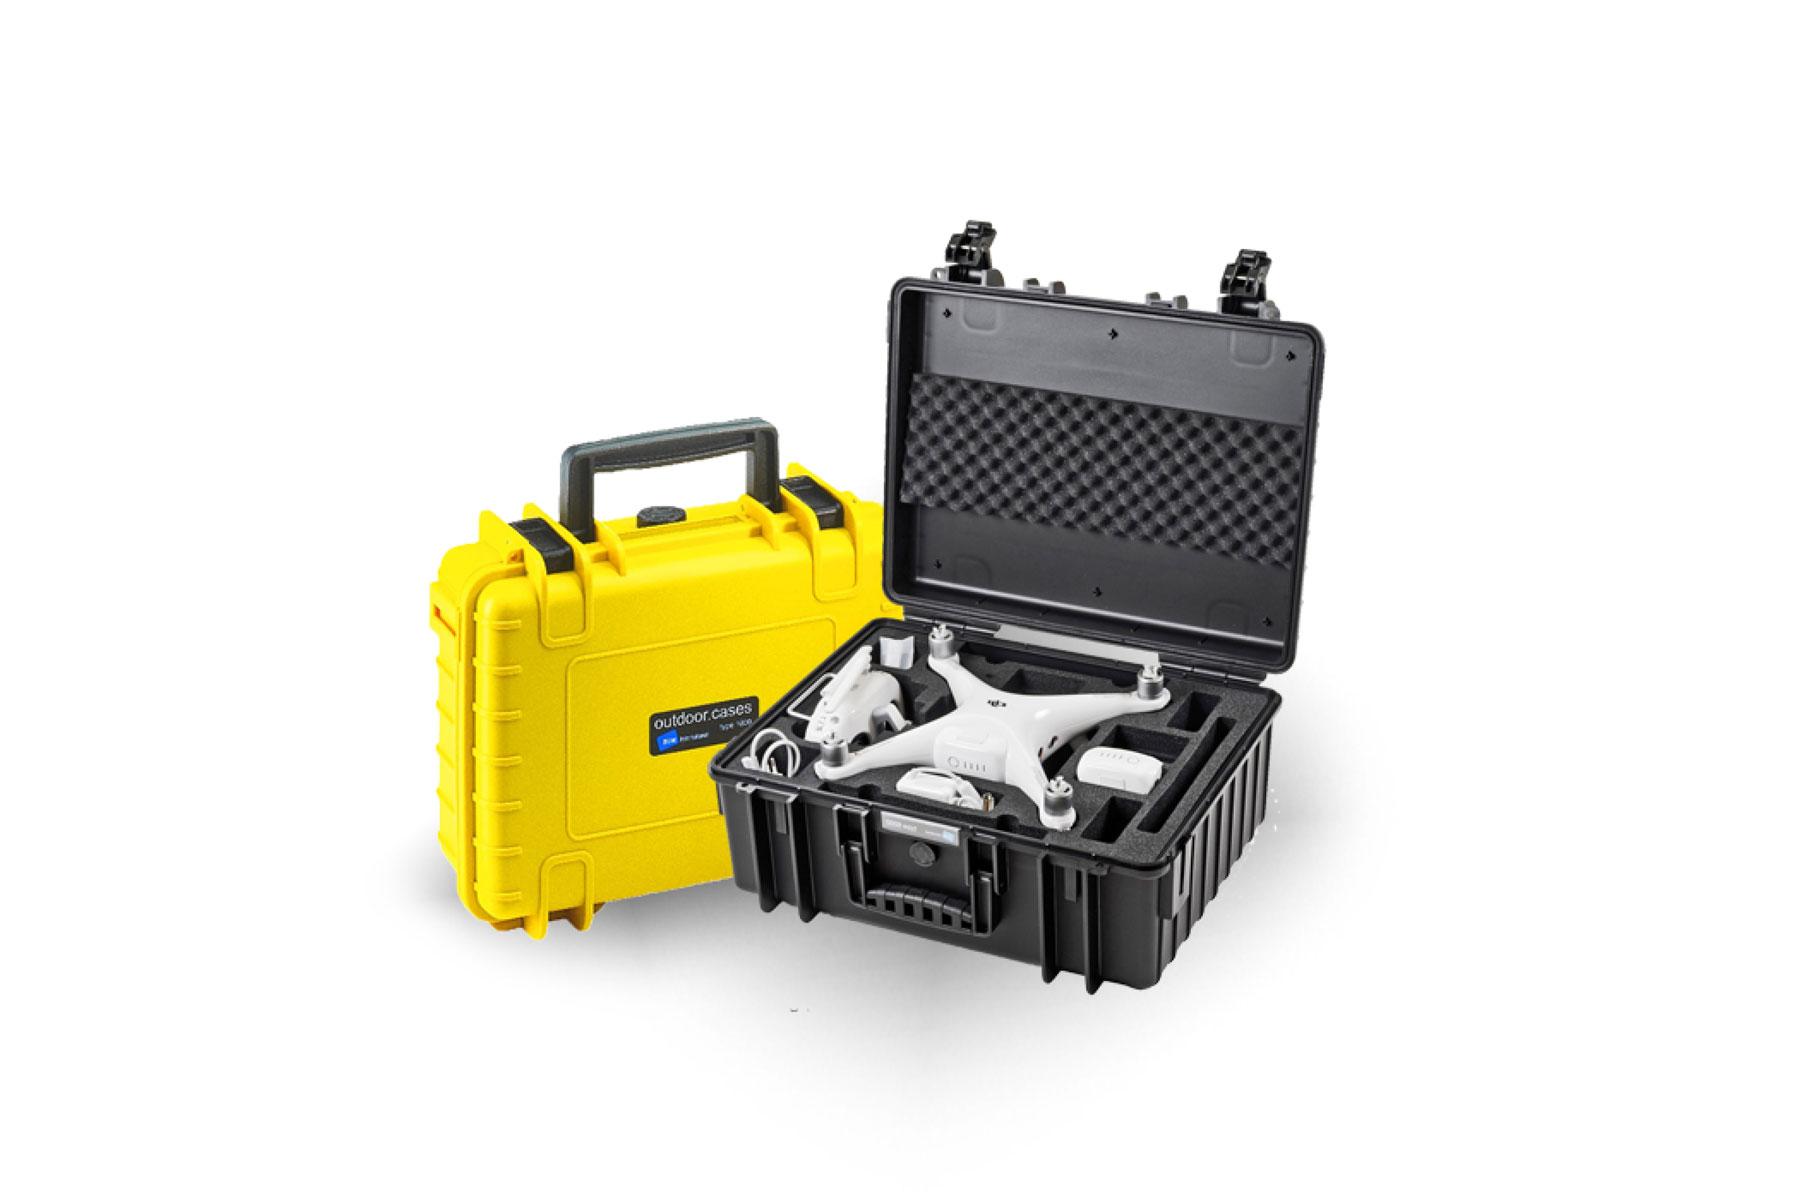 Fototaschen - Fotokoffer